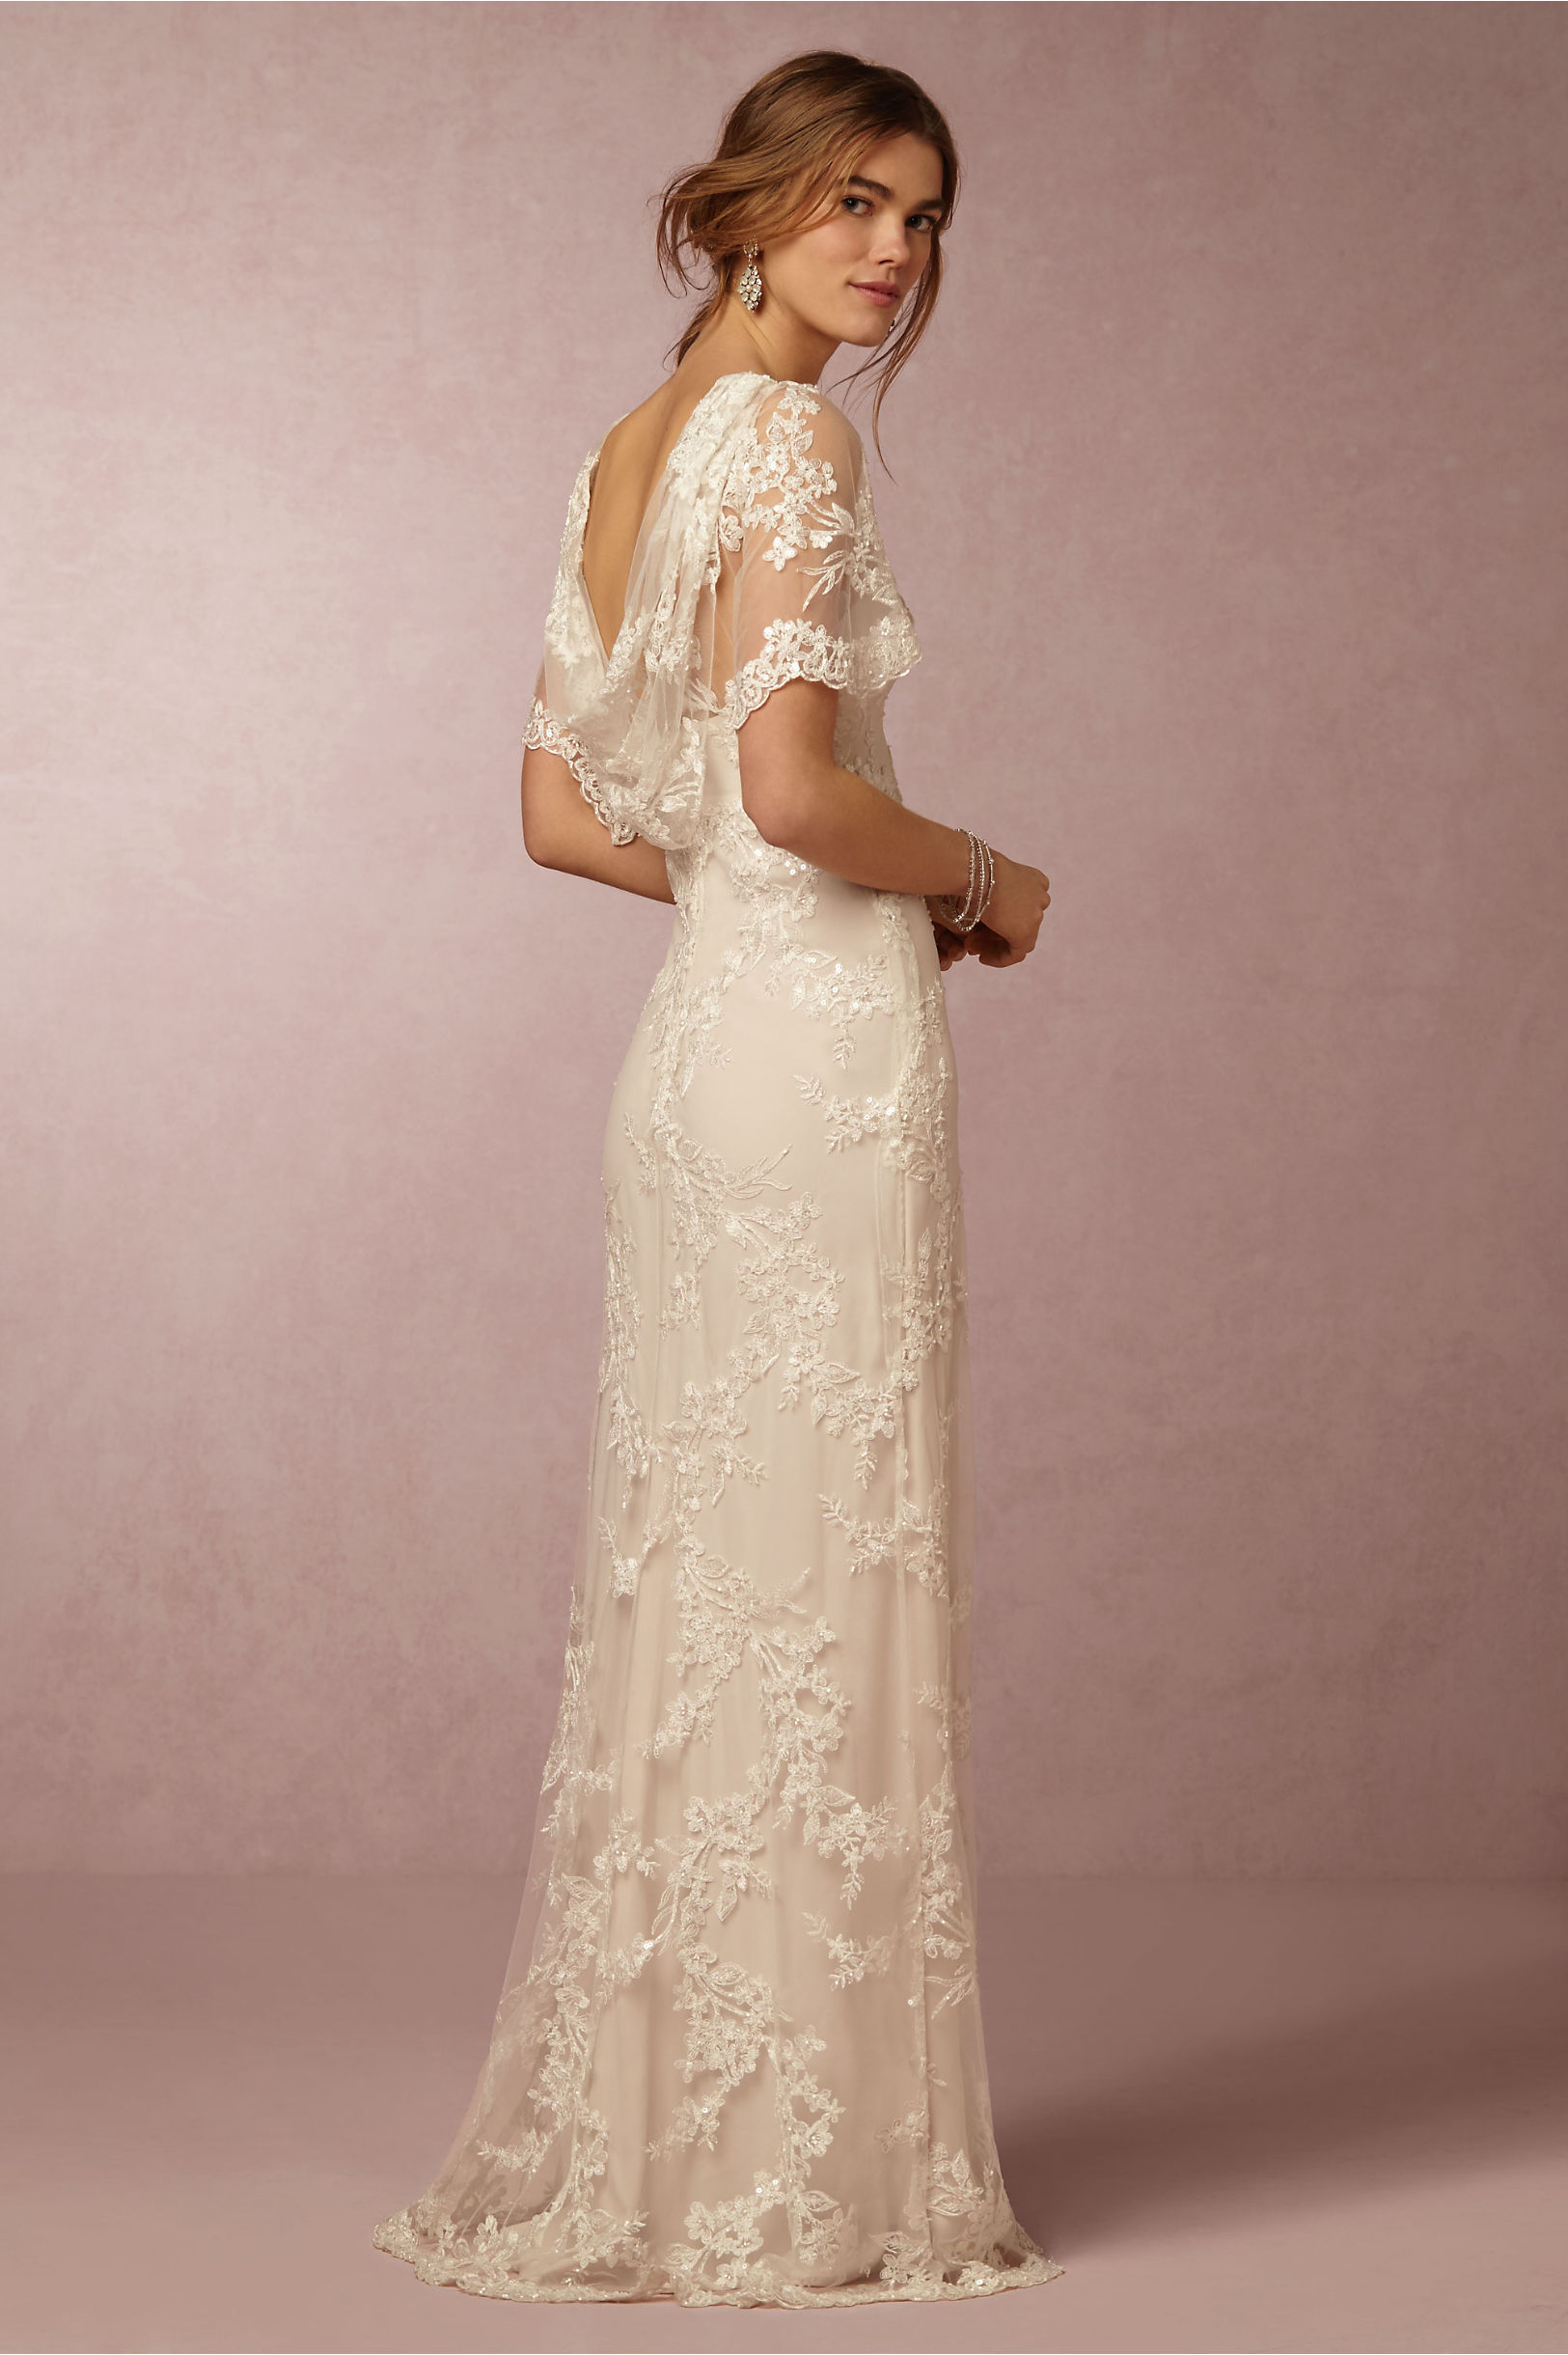 estella gown cheapest wedding dresses Marchesa Notte Ivory Estella Gown BHLDN